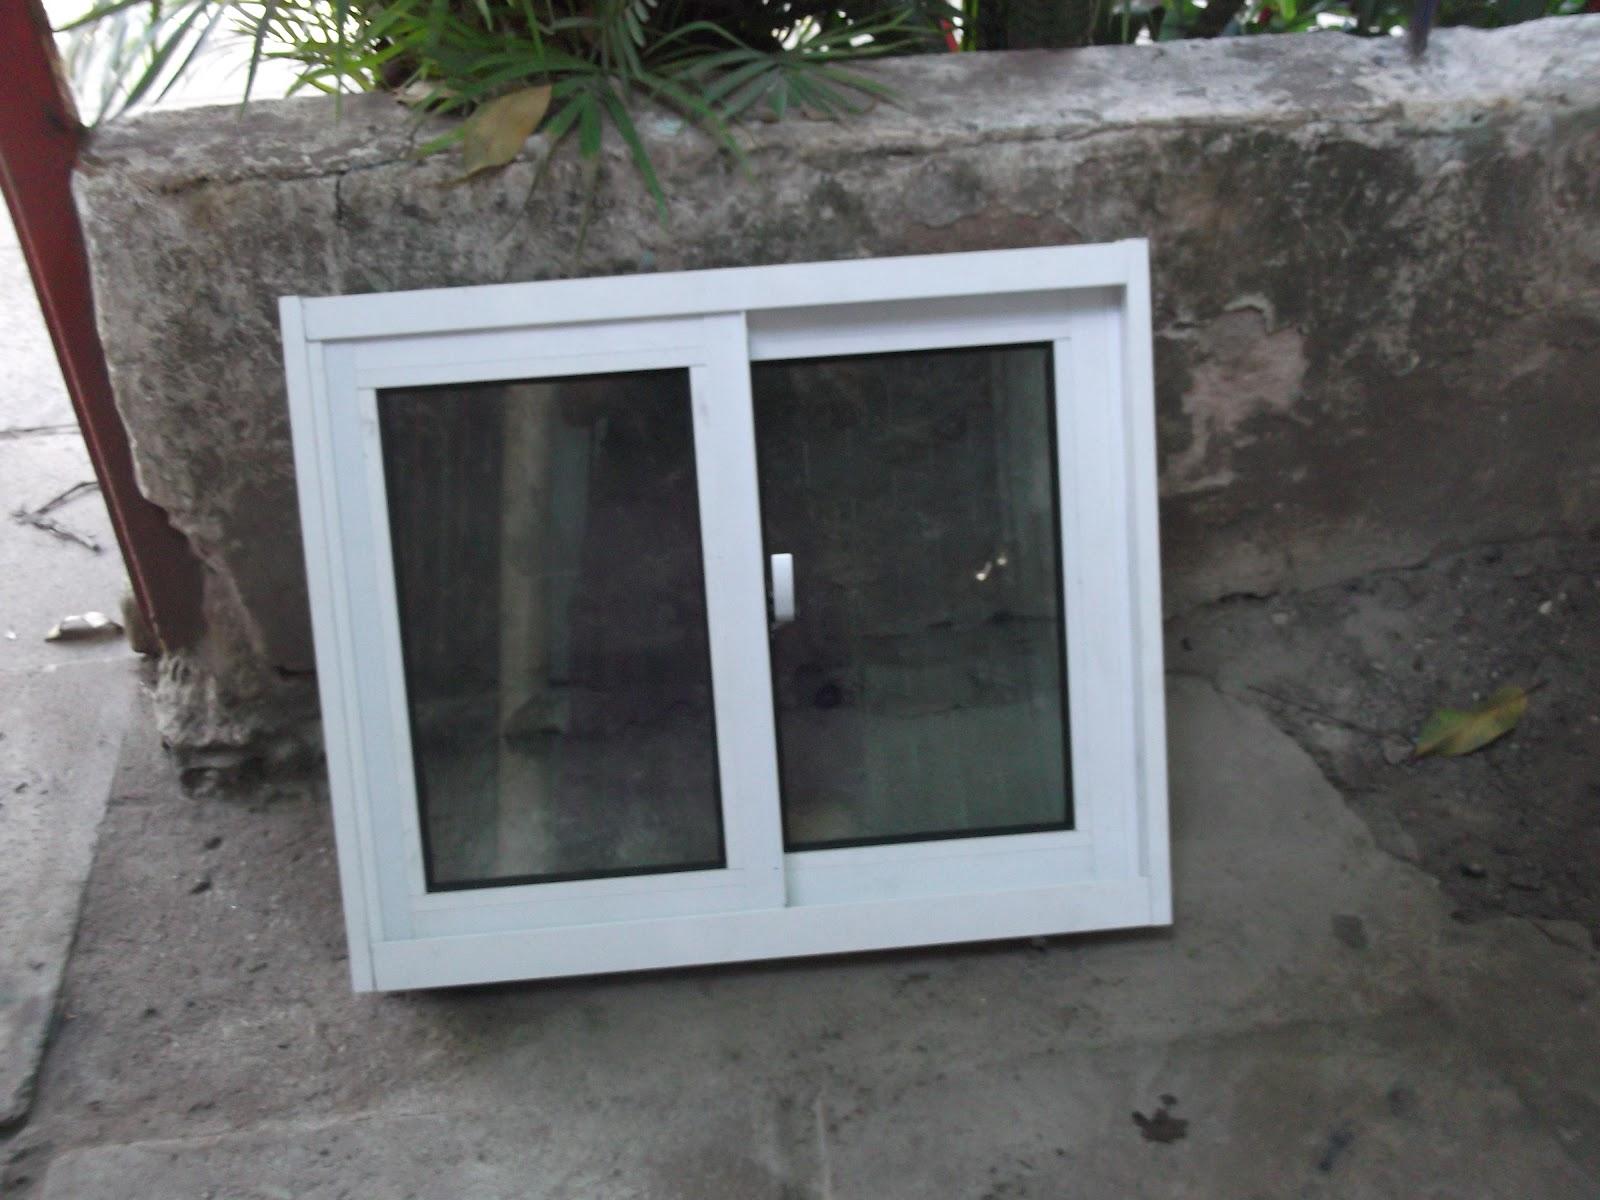 #51617A Esquadritec Serralharia: Janela de Alumínio Corrediça na cor branca 1694 Janela De Aluminio Na Cor Branca